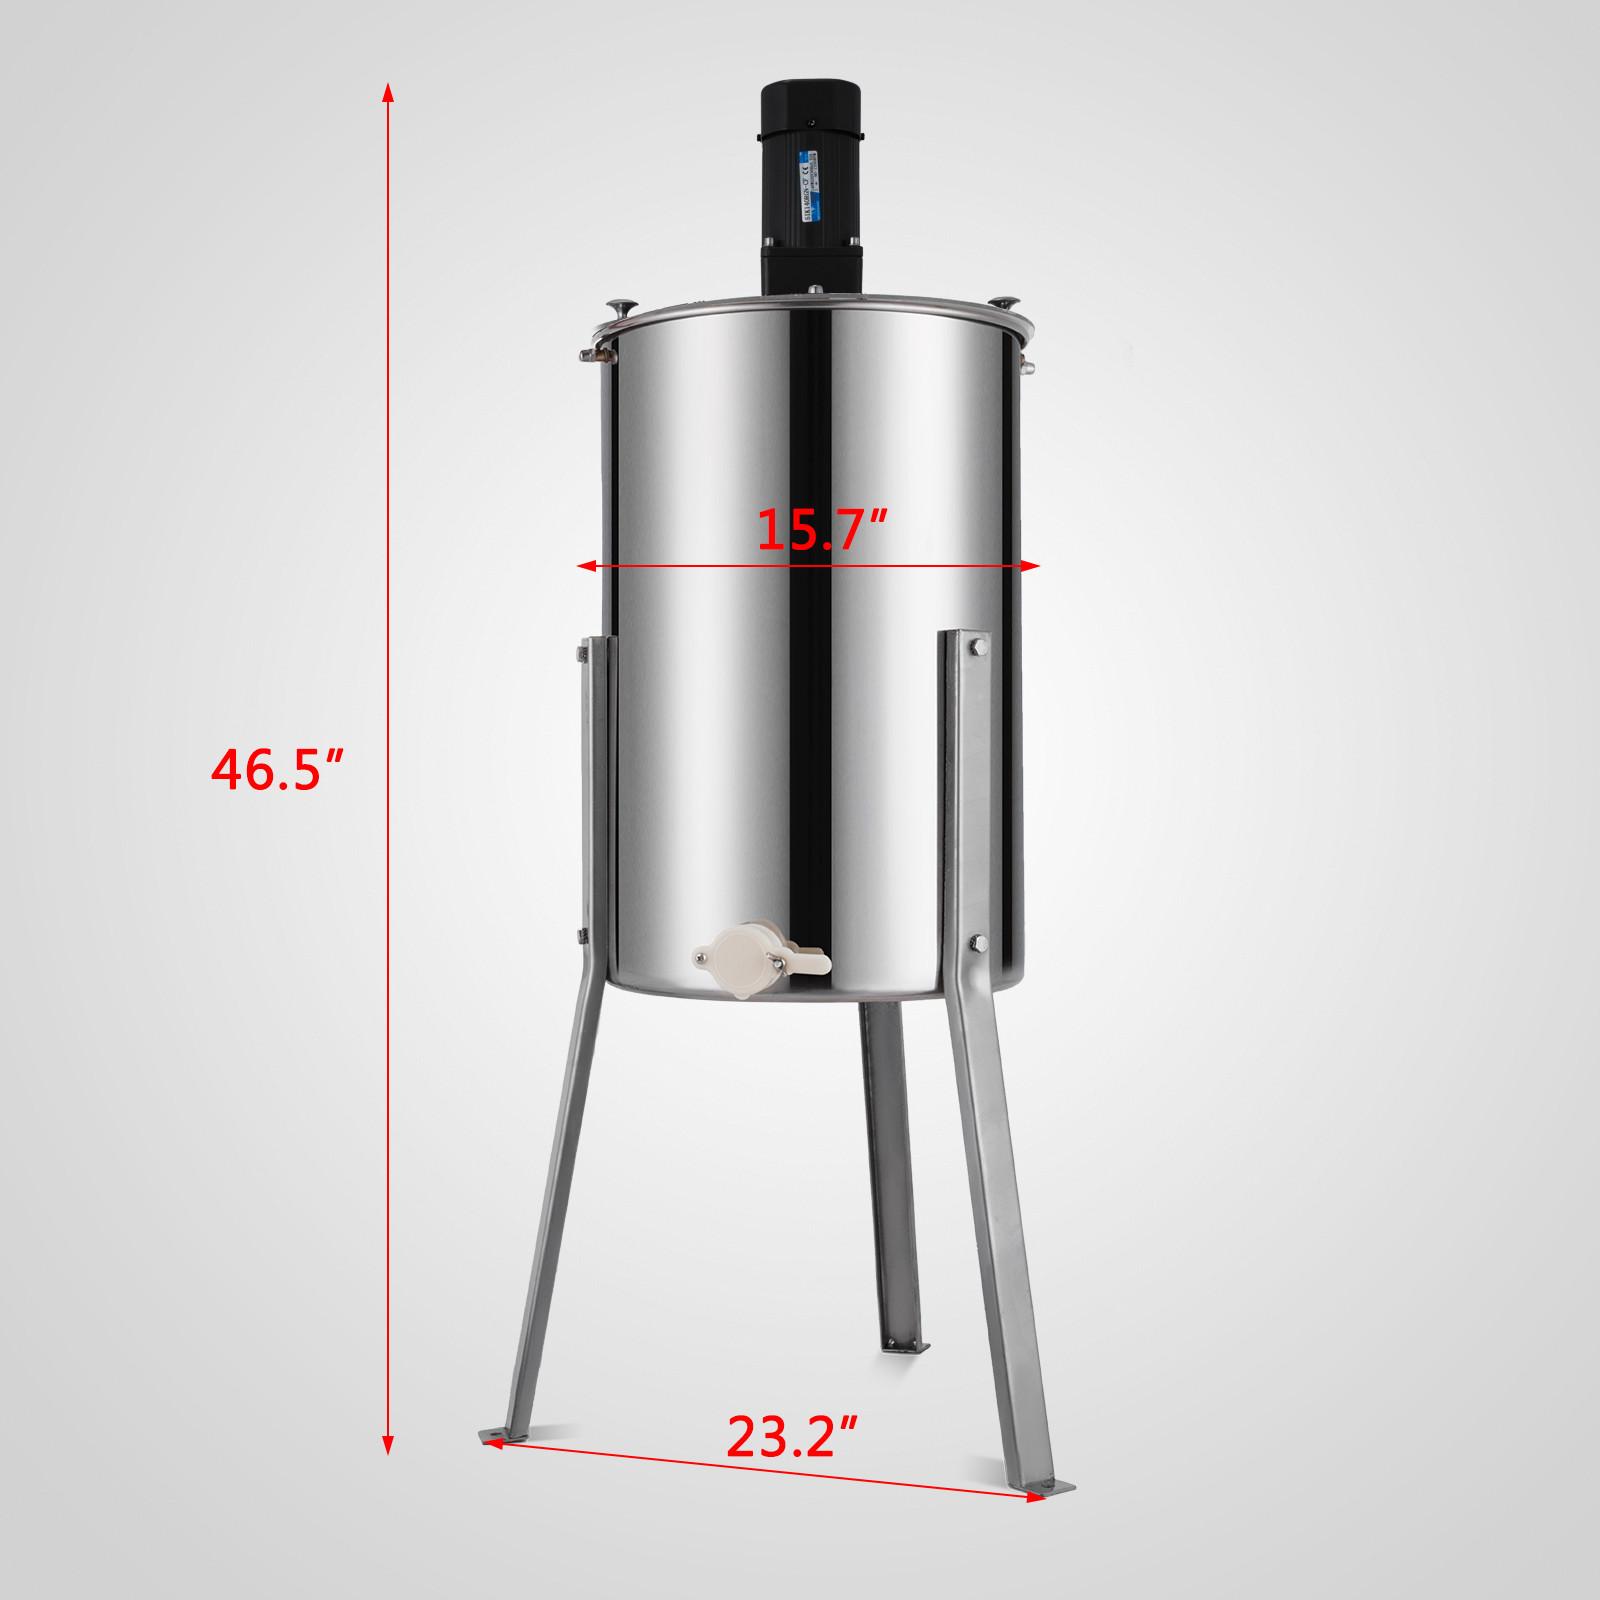 Extracteur-de-Miel-Electrique-manuelle-2-3-4-Cadres-En-Acier-Inox-Centrifugeuse miniature 26